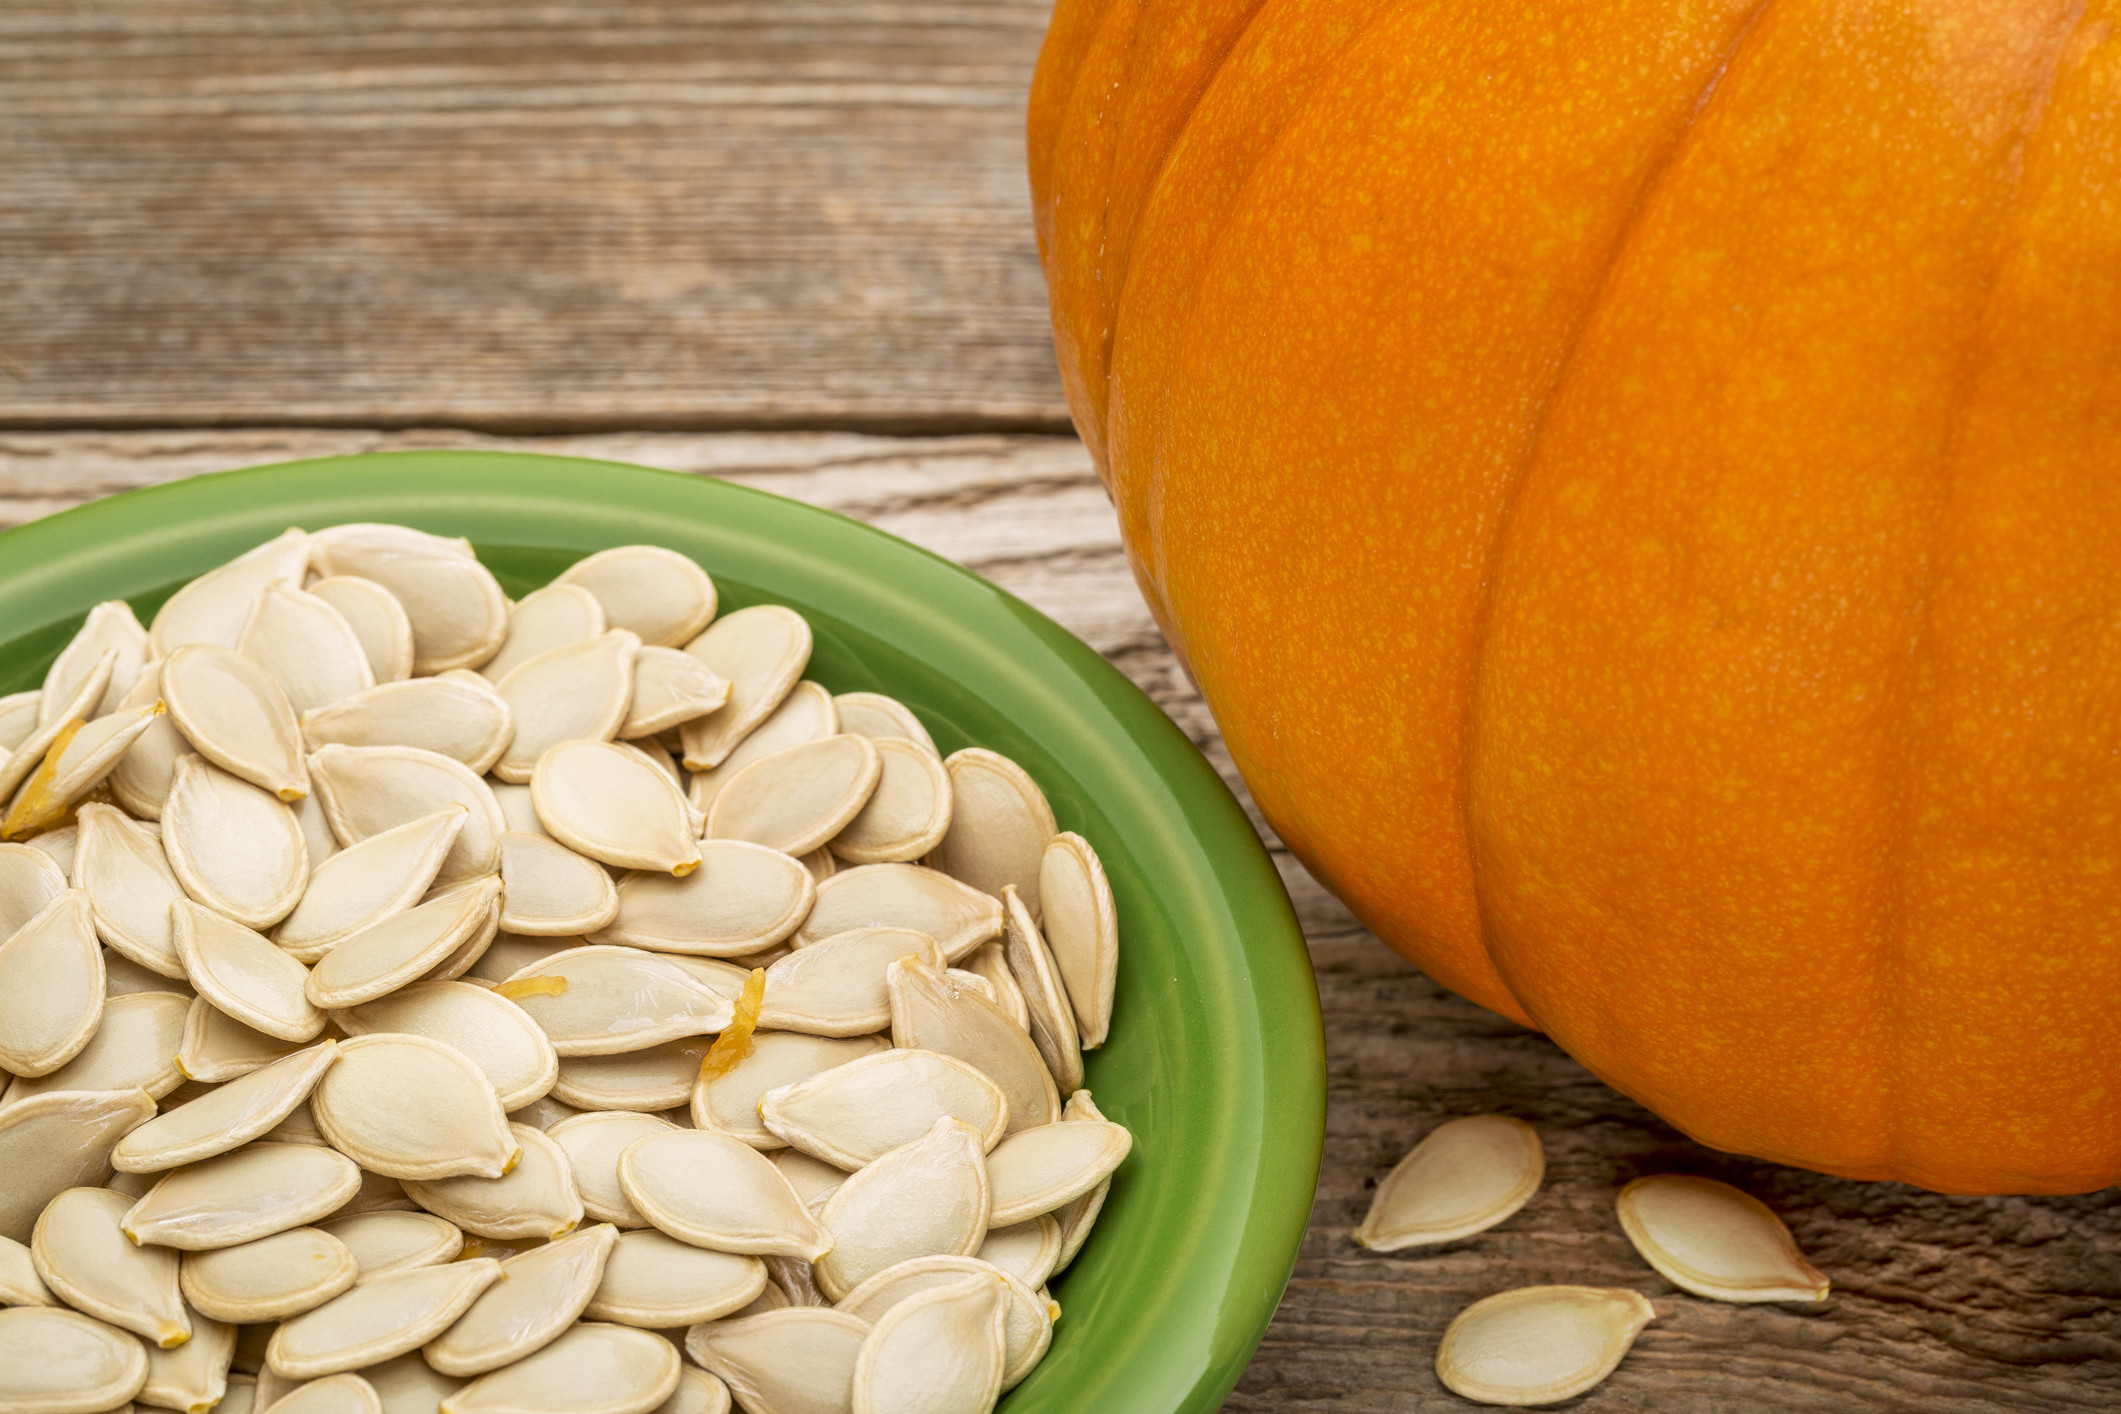 Pumpkin Seeds Healthy  Pumpkin Seeds 7 Ways Infographic – Health Essentials